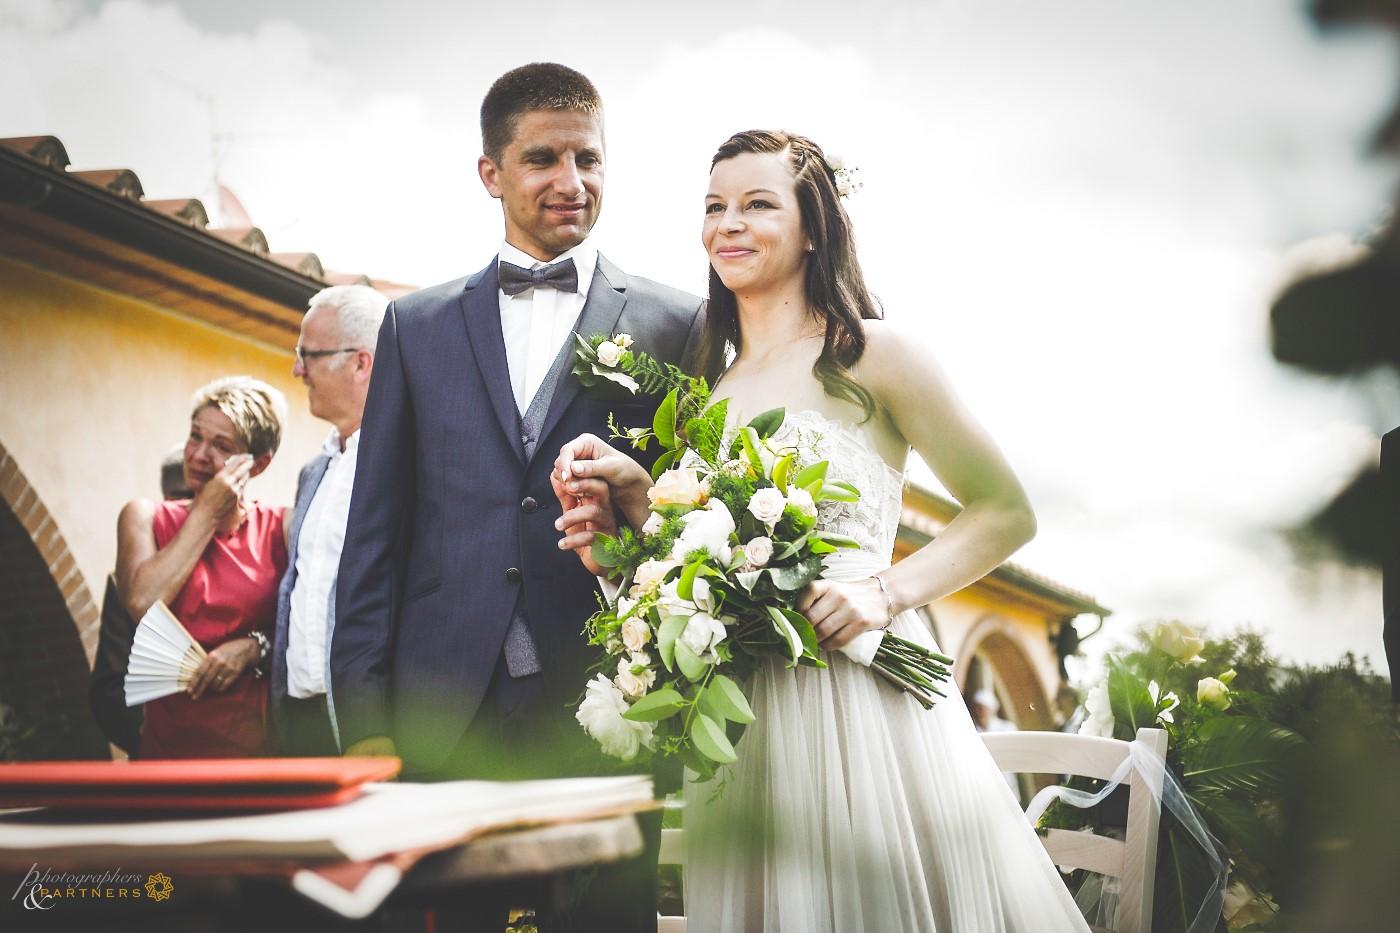 photographer_weddings_grosseto_04.jpg